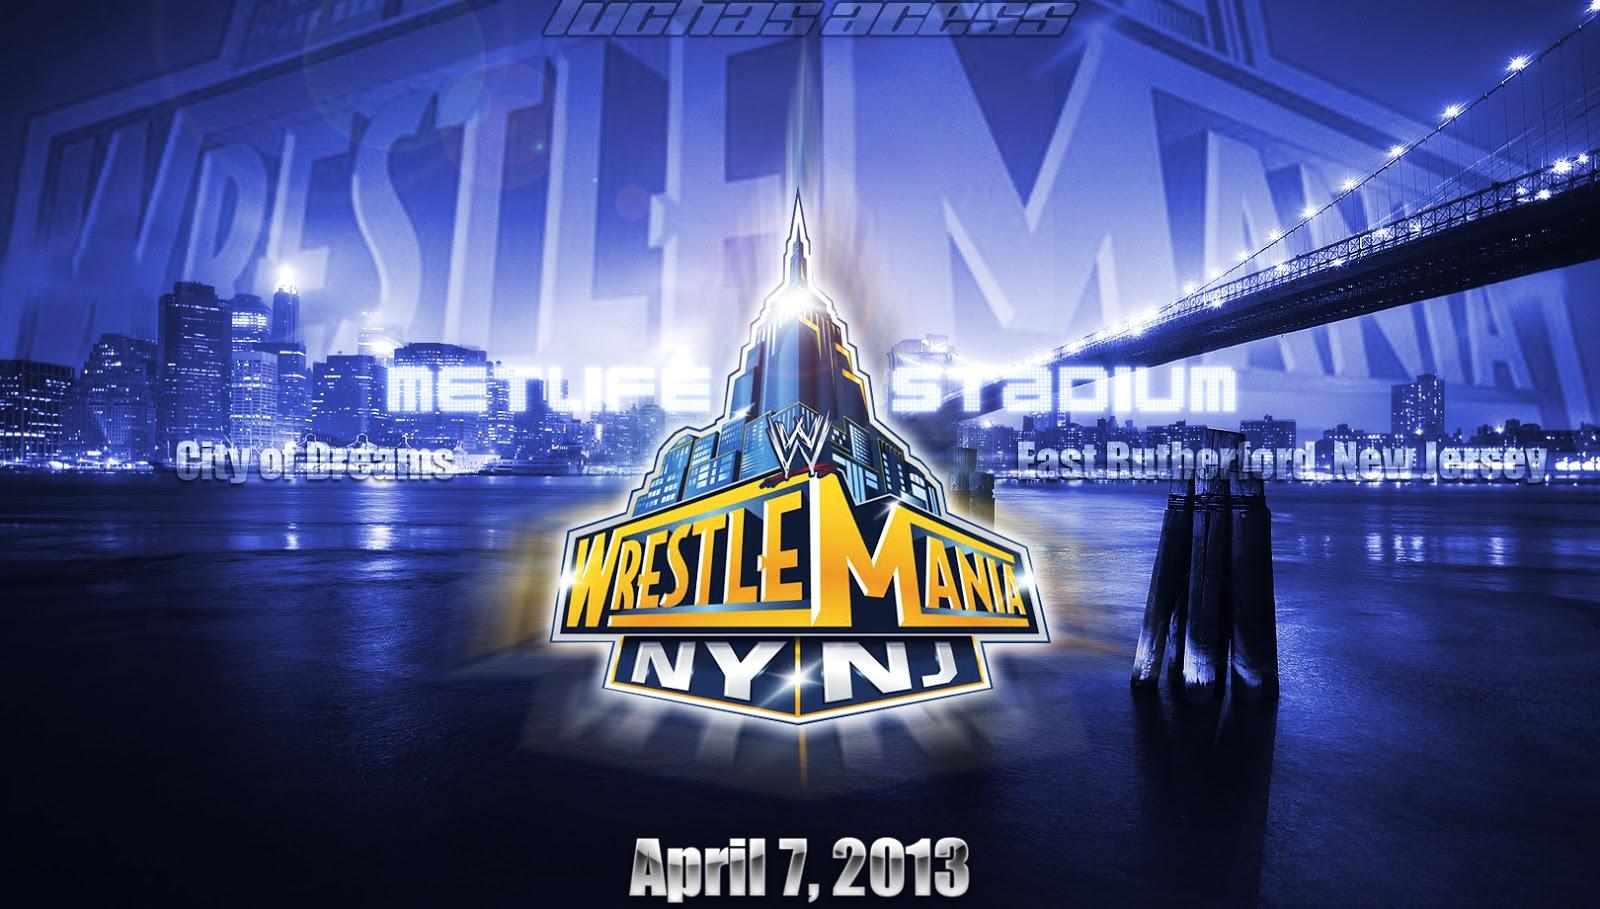 http://1.bp.blogspot.com/-26BigpK19wU/UW5BG5lufFI/AAAAAAAAKBo/amo79ZdC7Ro/s1600/WWE+WrestleMania+29+hd+Wallpapers+2013_0.jpg